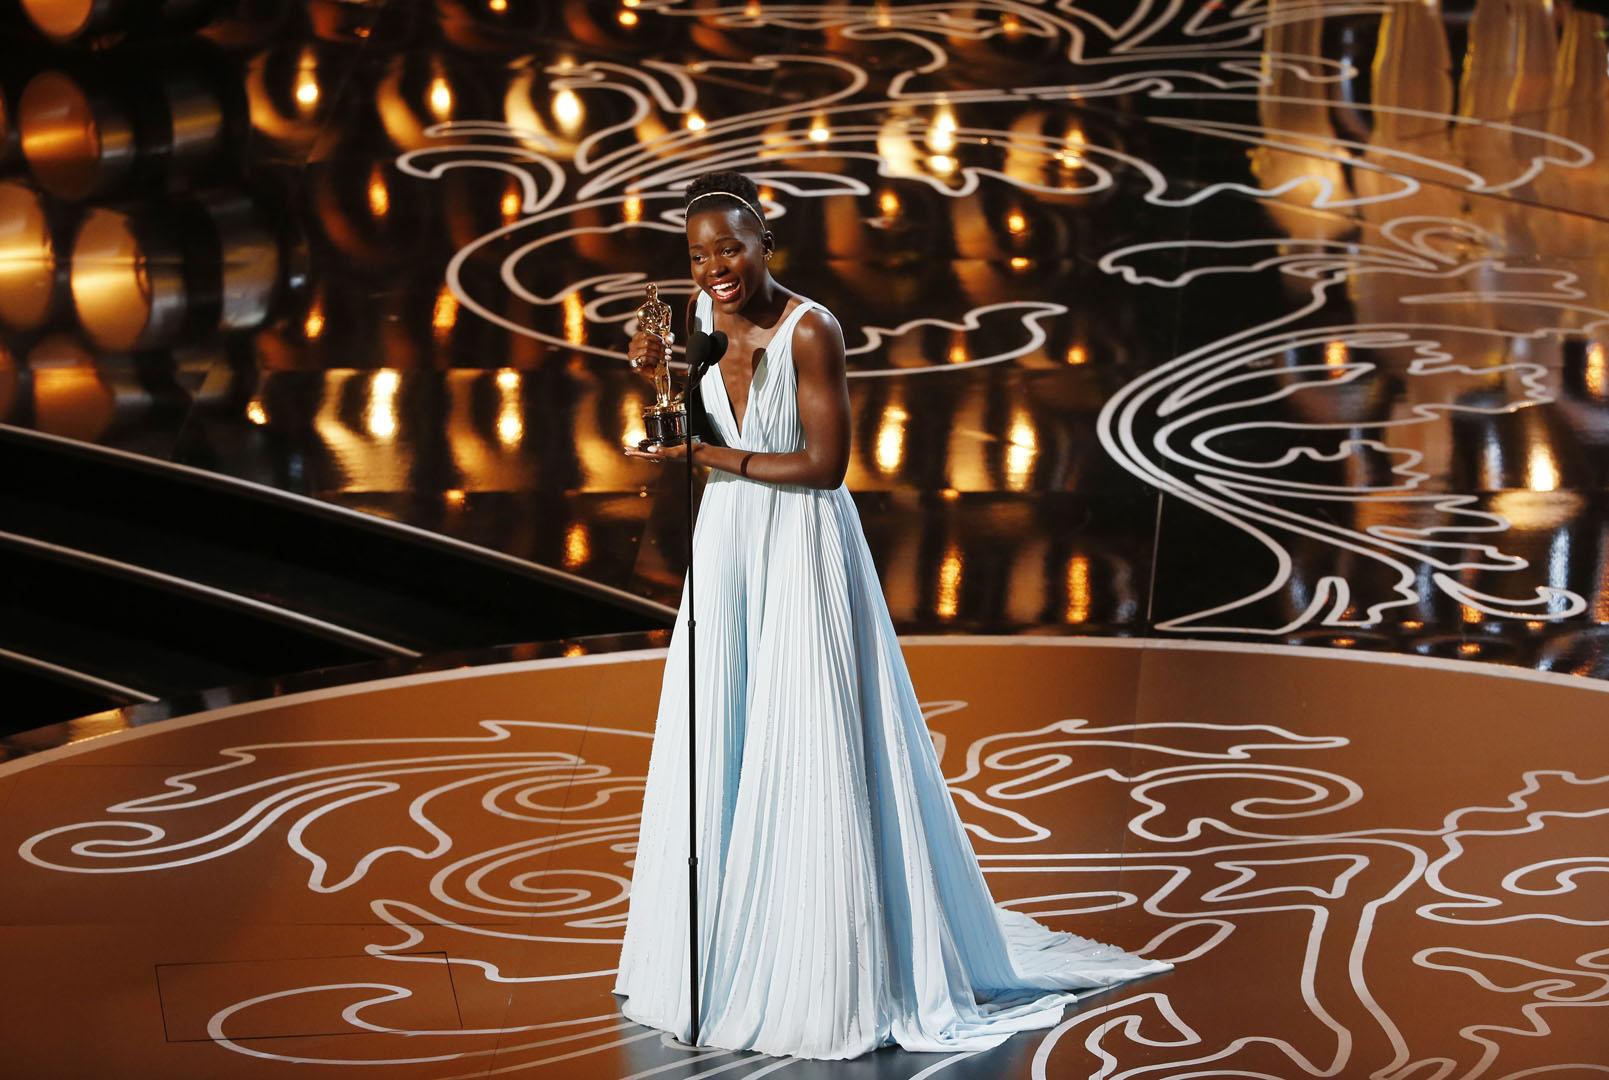 96b32cd1a 12 years a slave» vant Oscar for beste film « NRK Filmpolitiet - alt ...